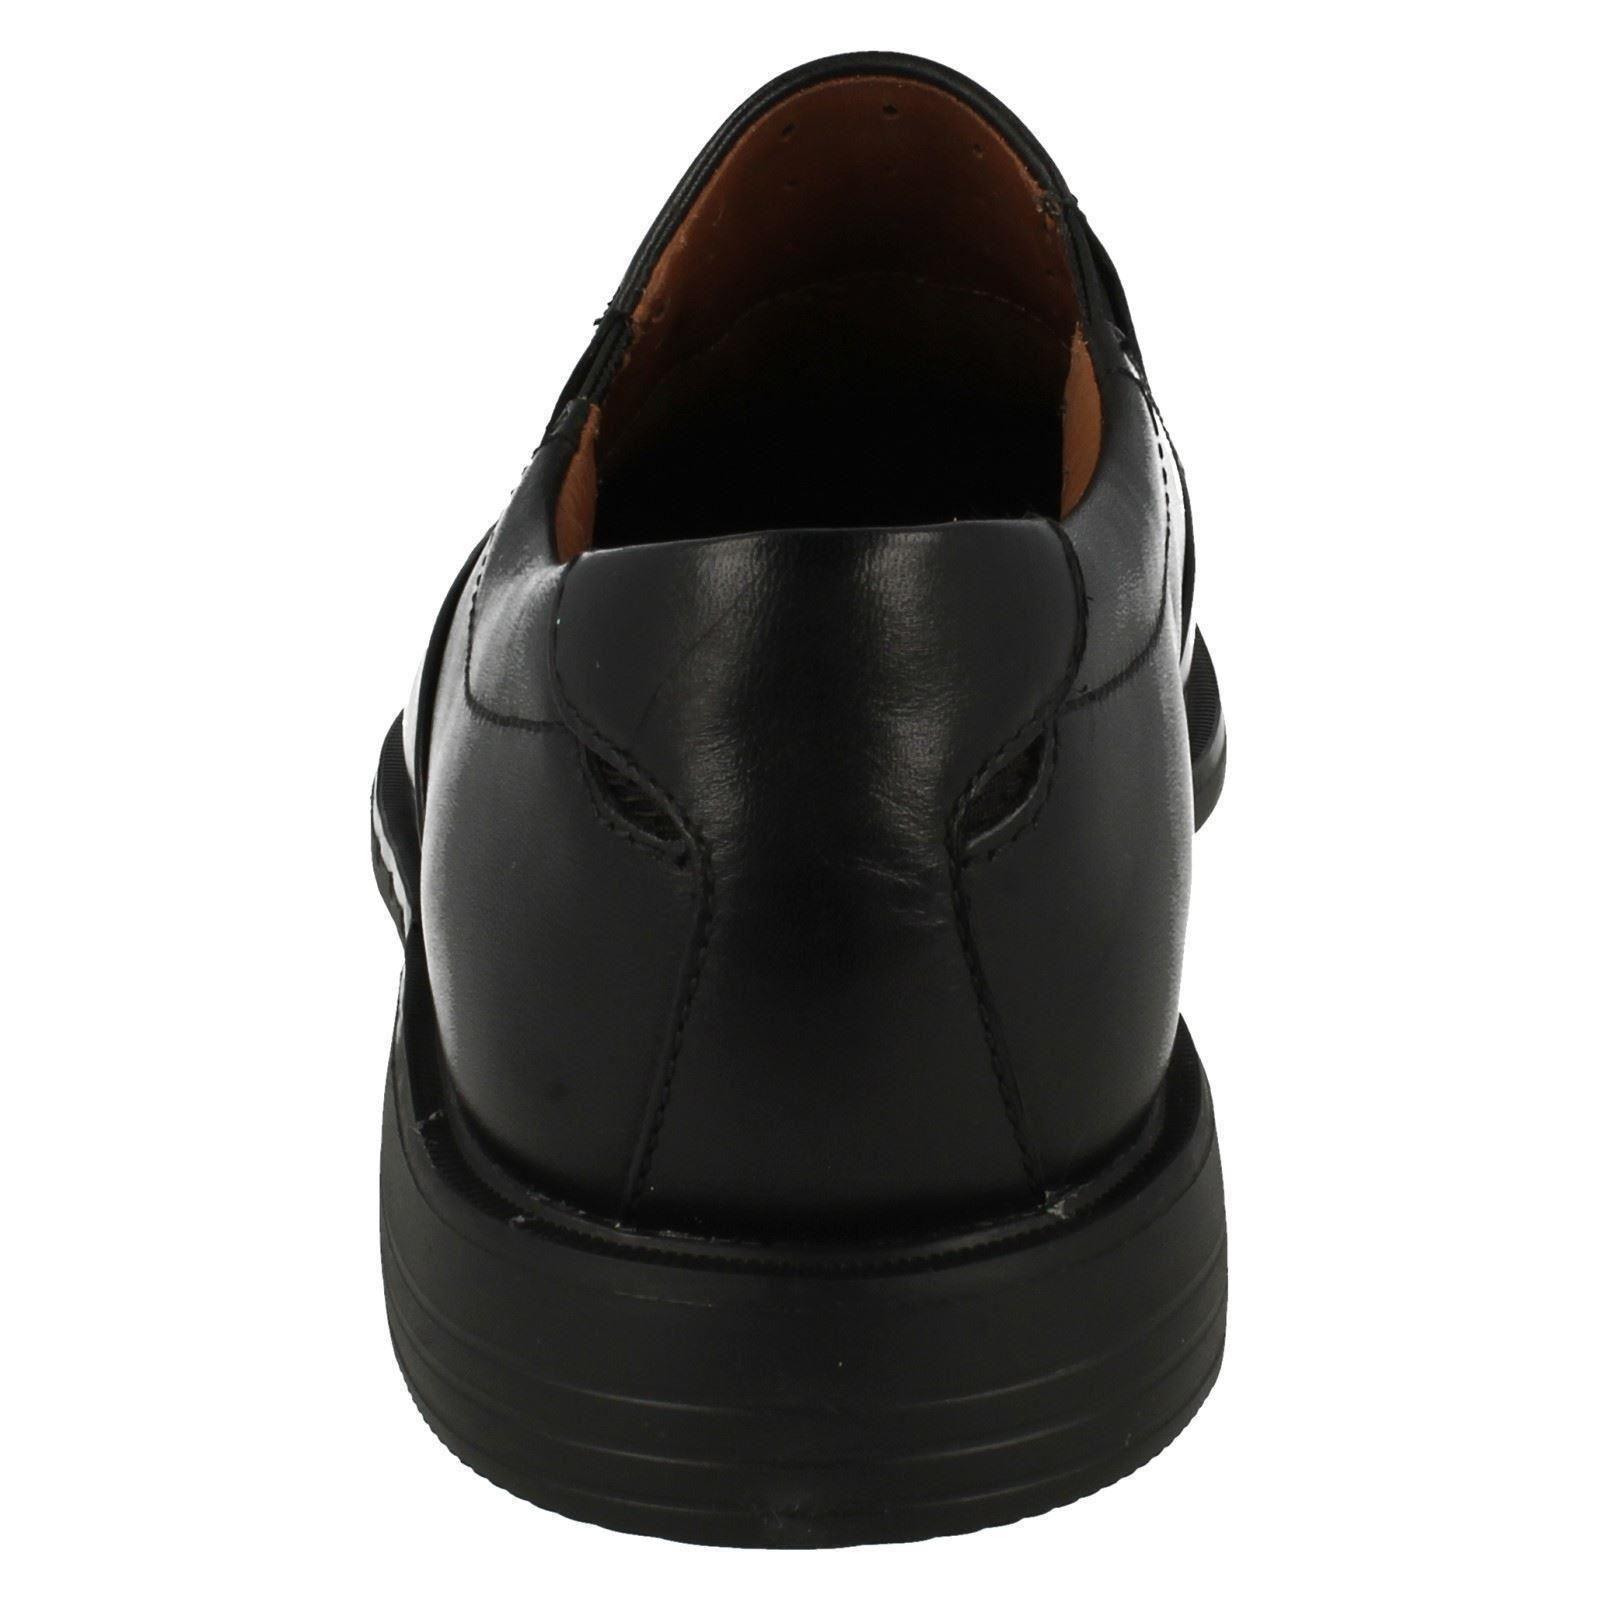 Mens Clarks Unstructured Slip On Shoes Unbizley Lane